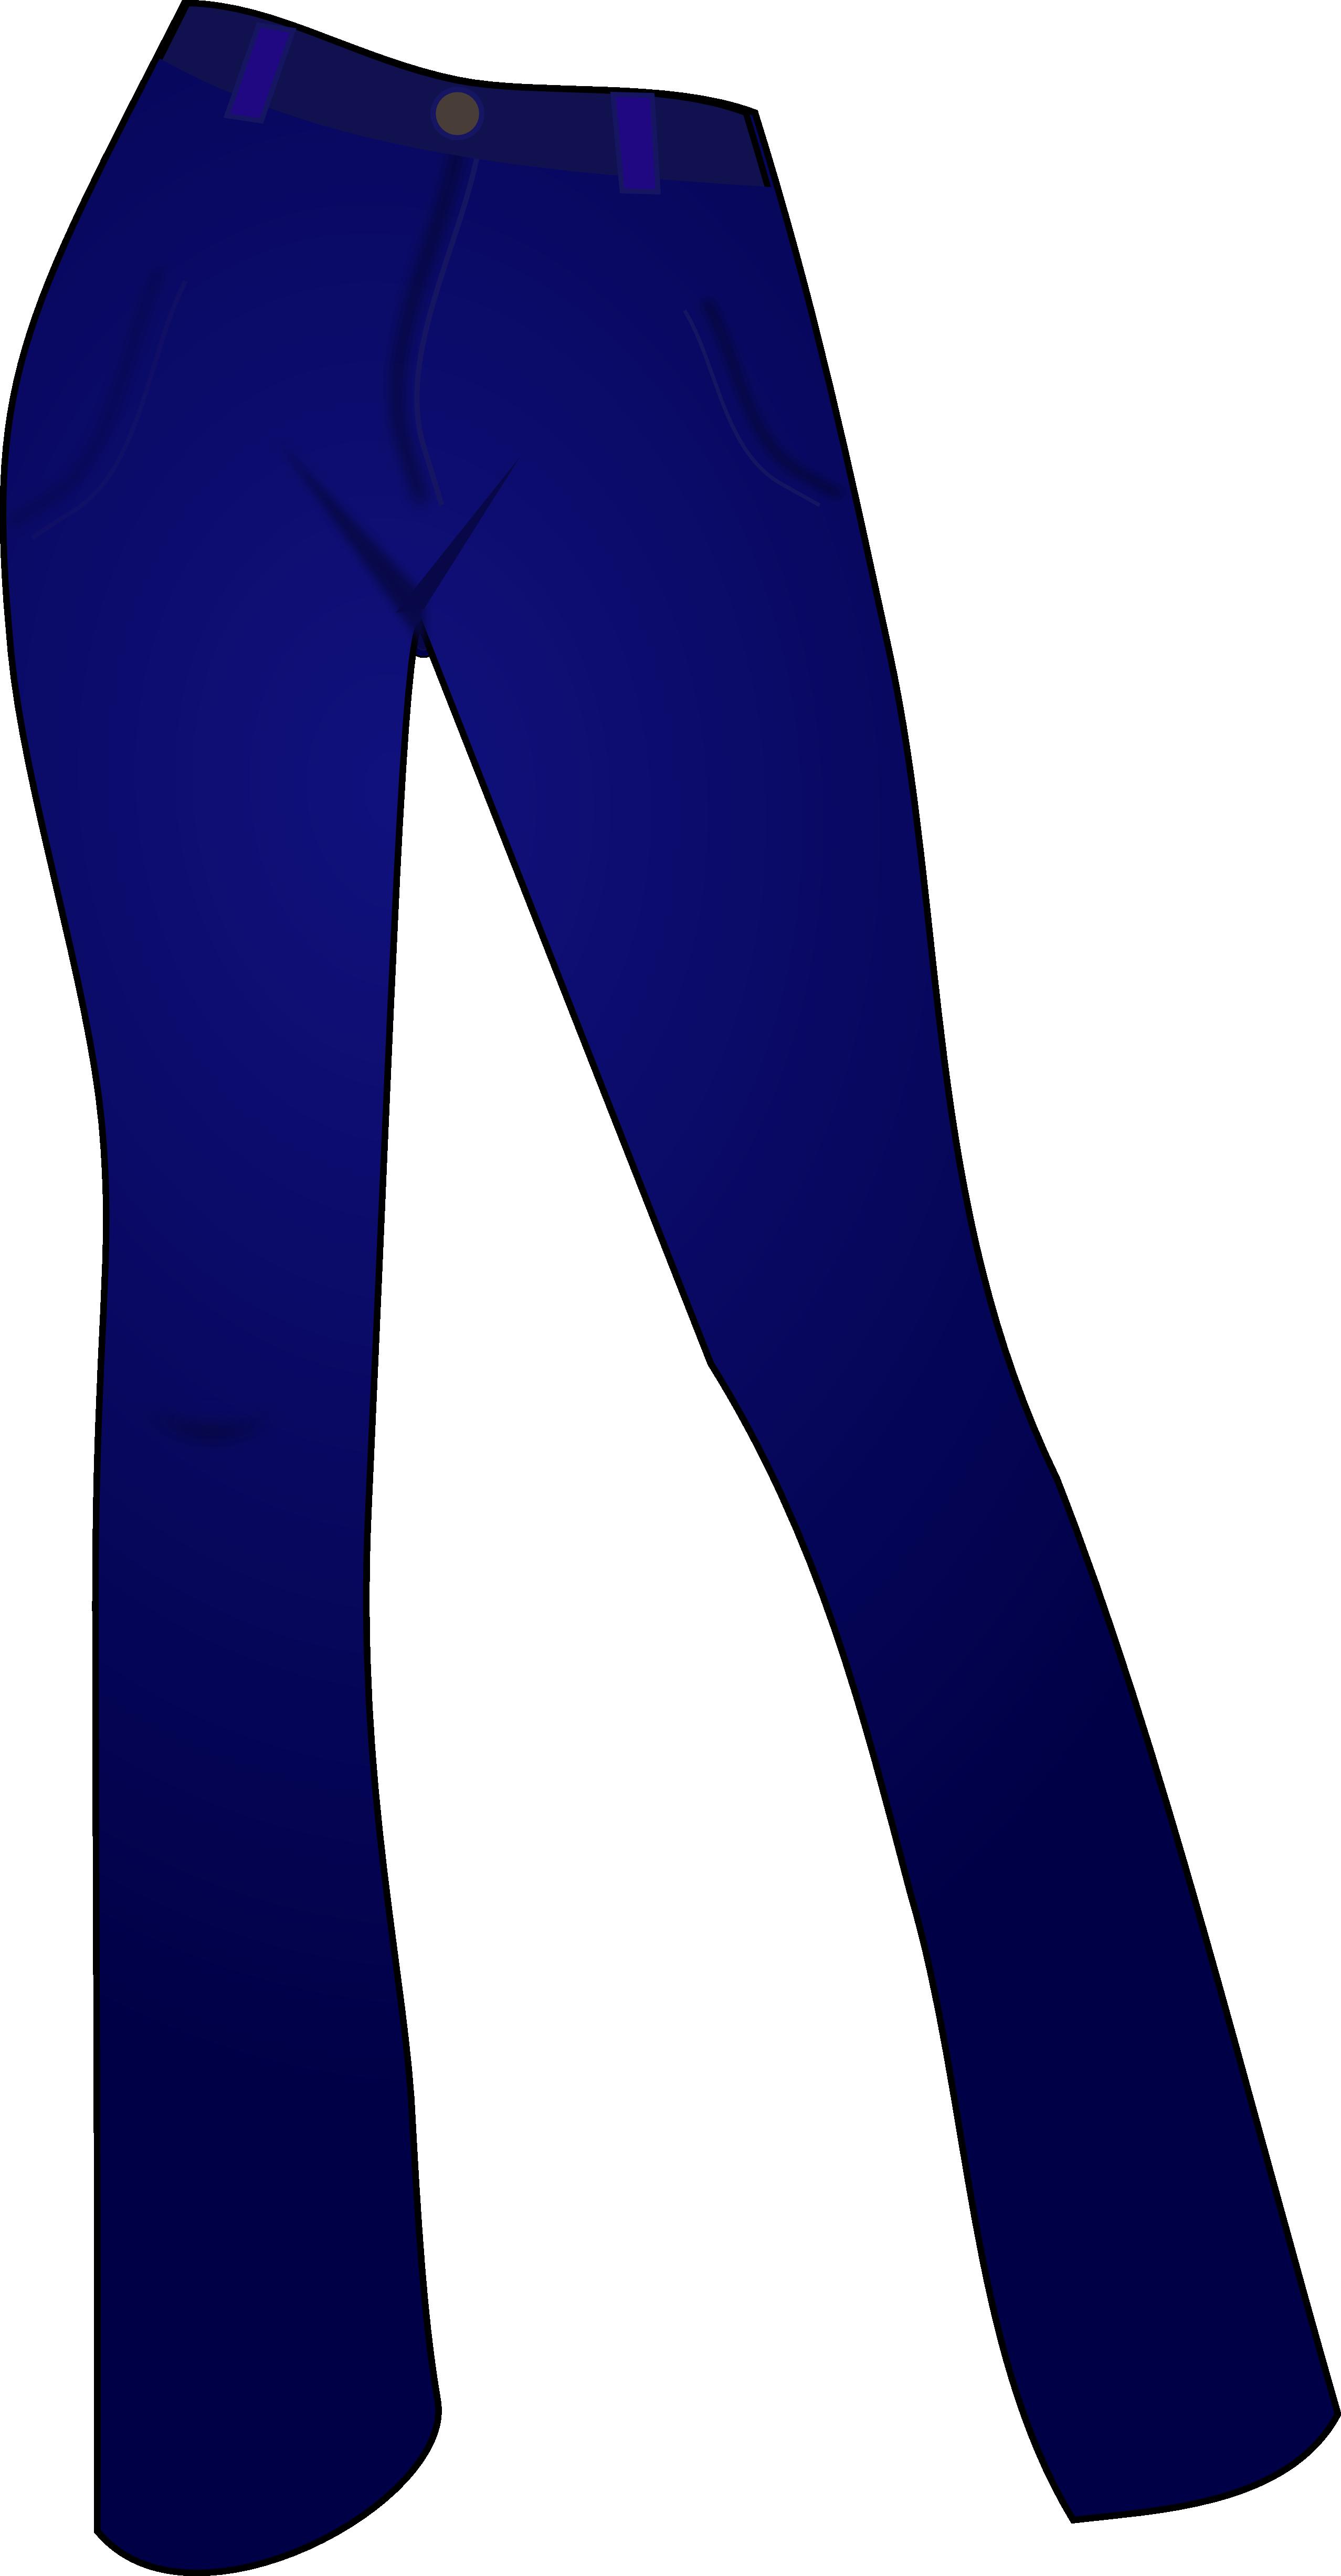 Jeans Clipart Coloring Page Jeans Coloring Page Transparent